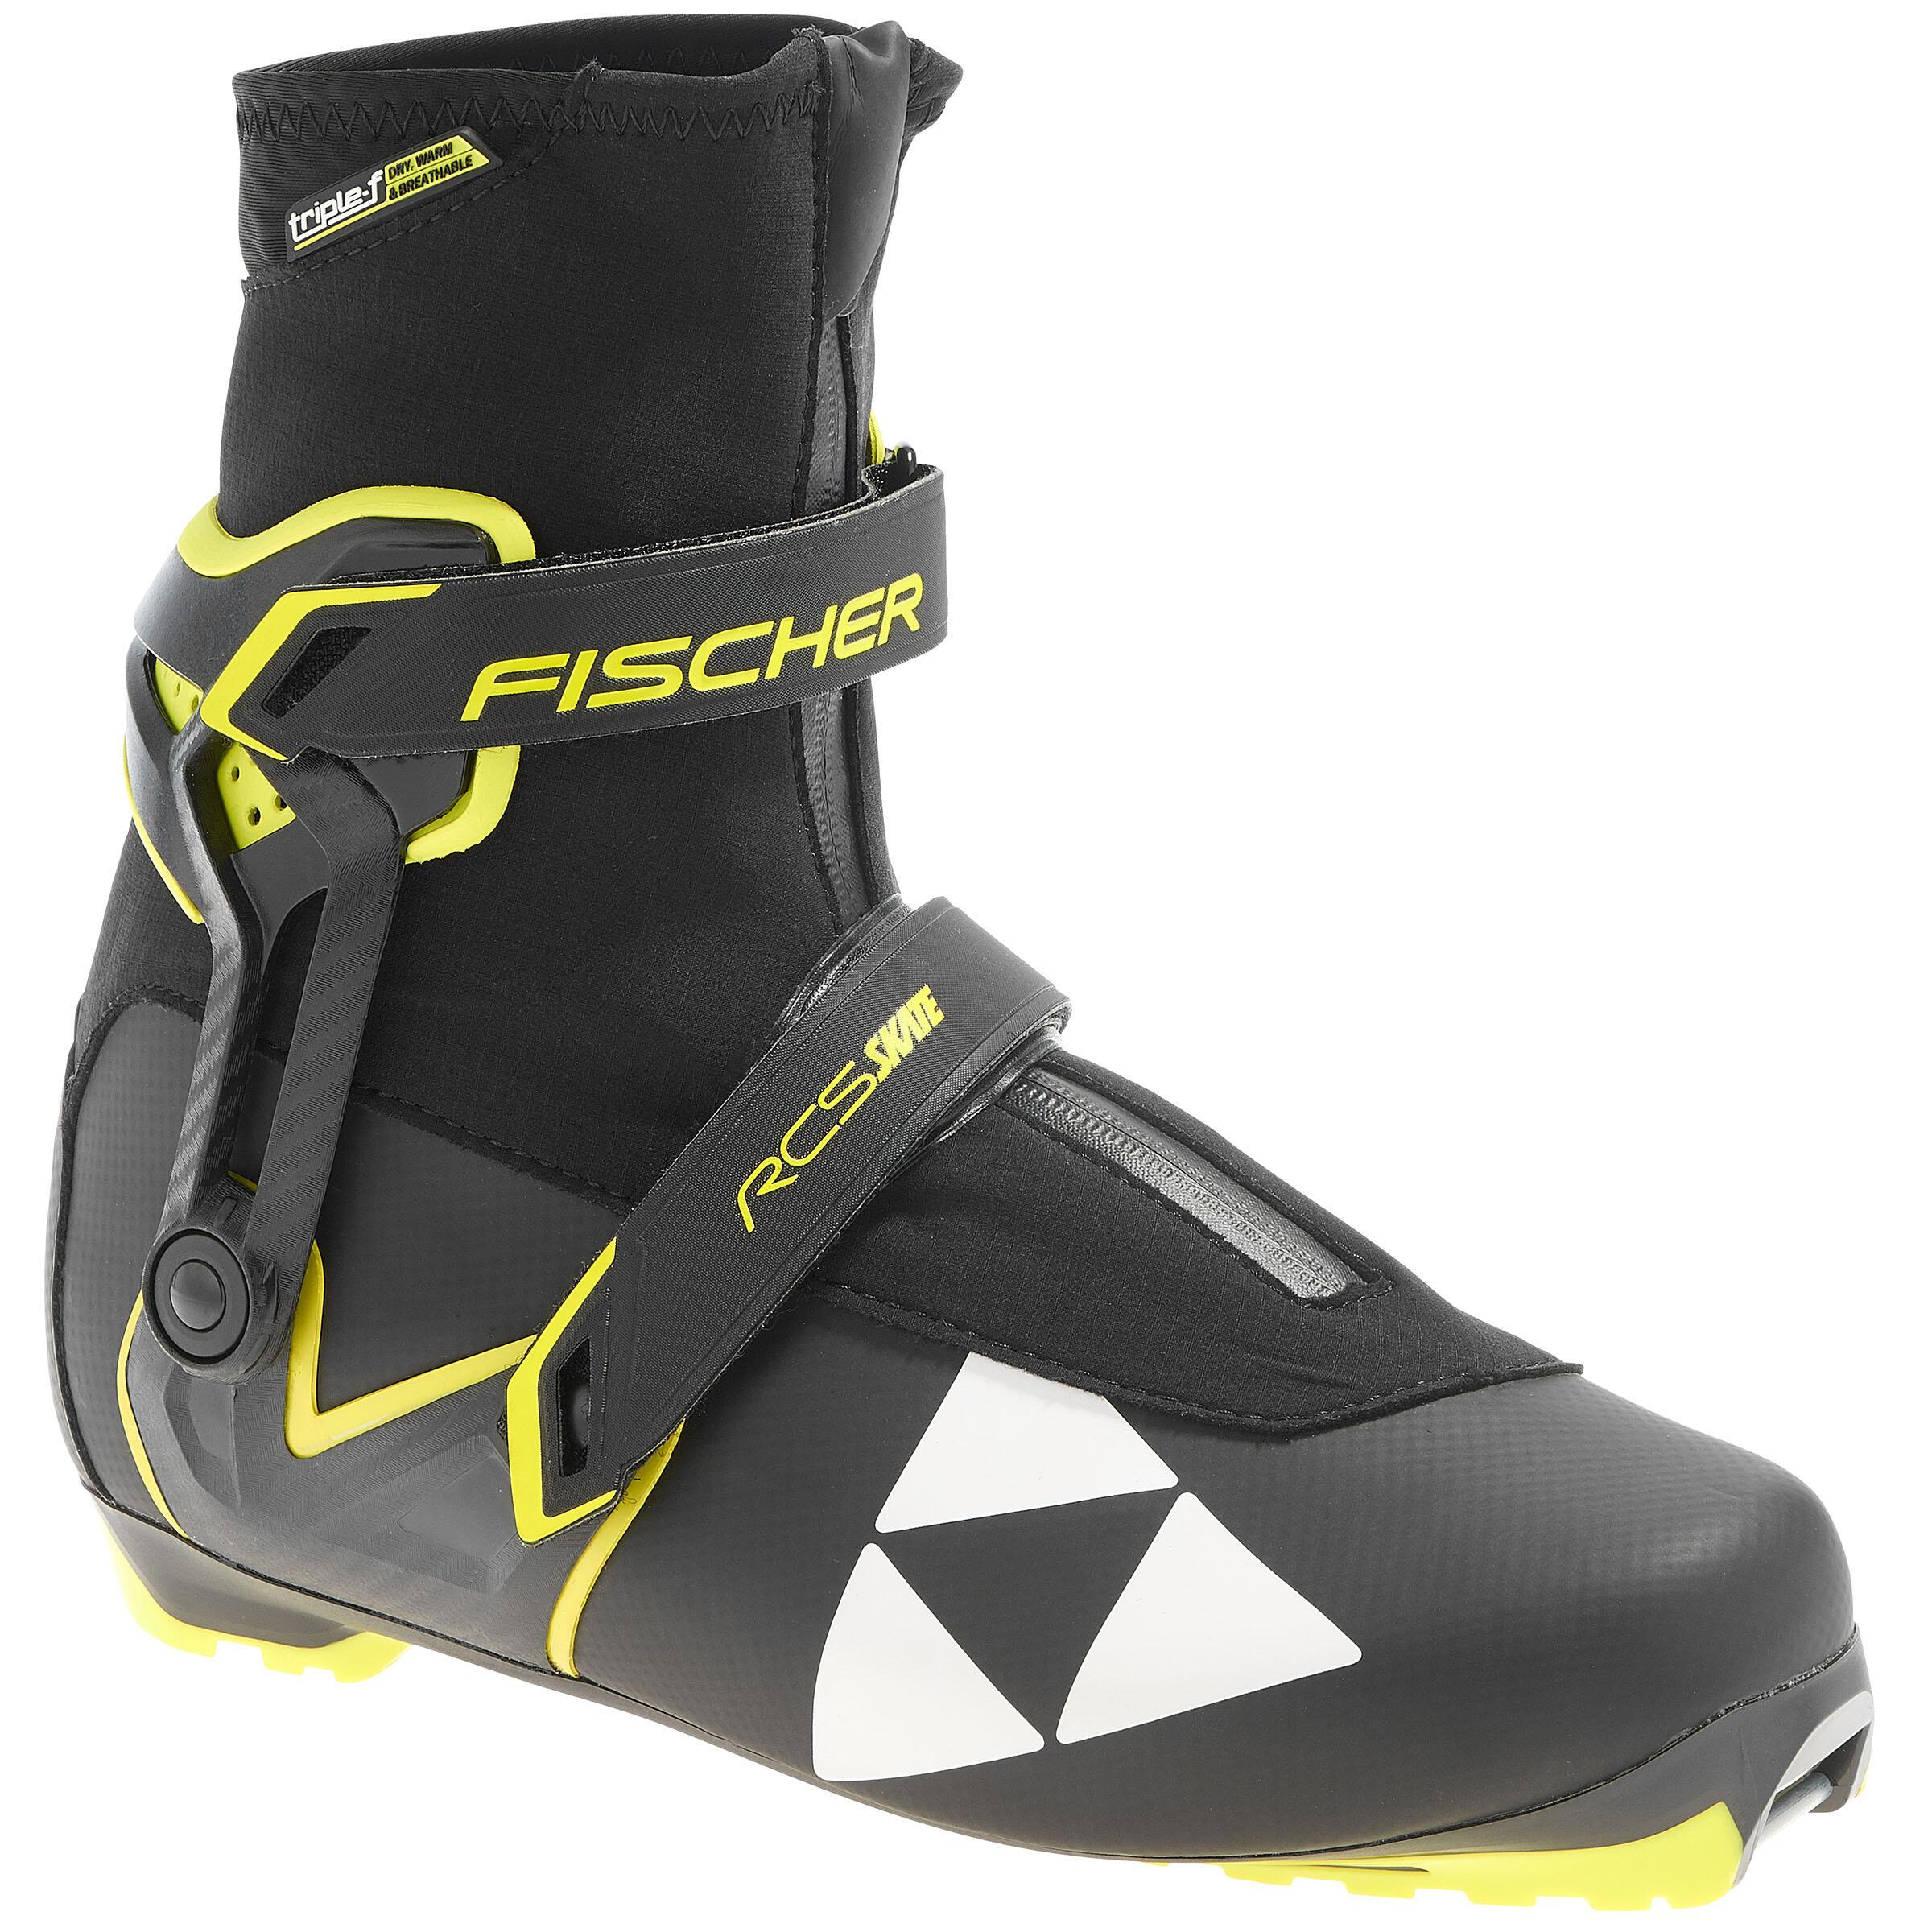 Chaussures ski de fond skate homme RCS TURNAMIC - Fischer